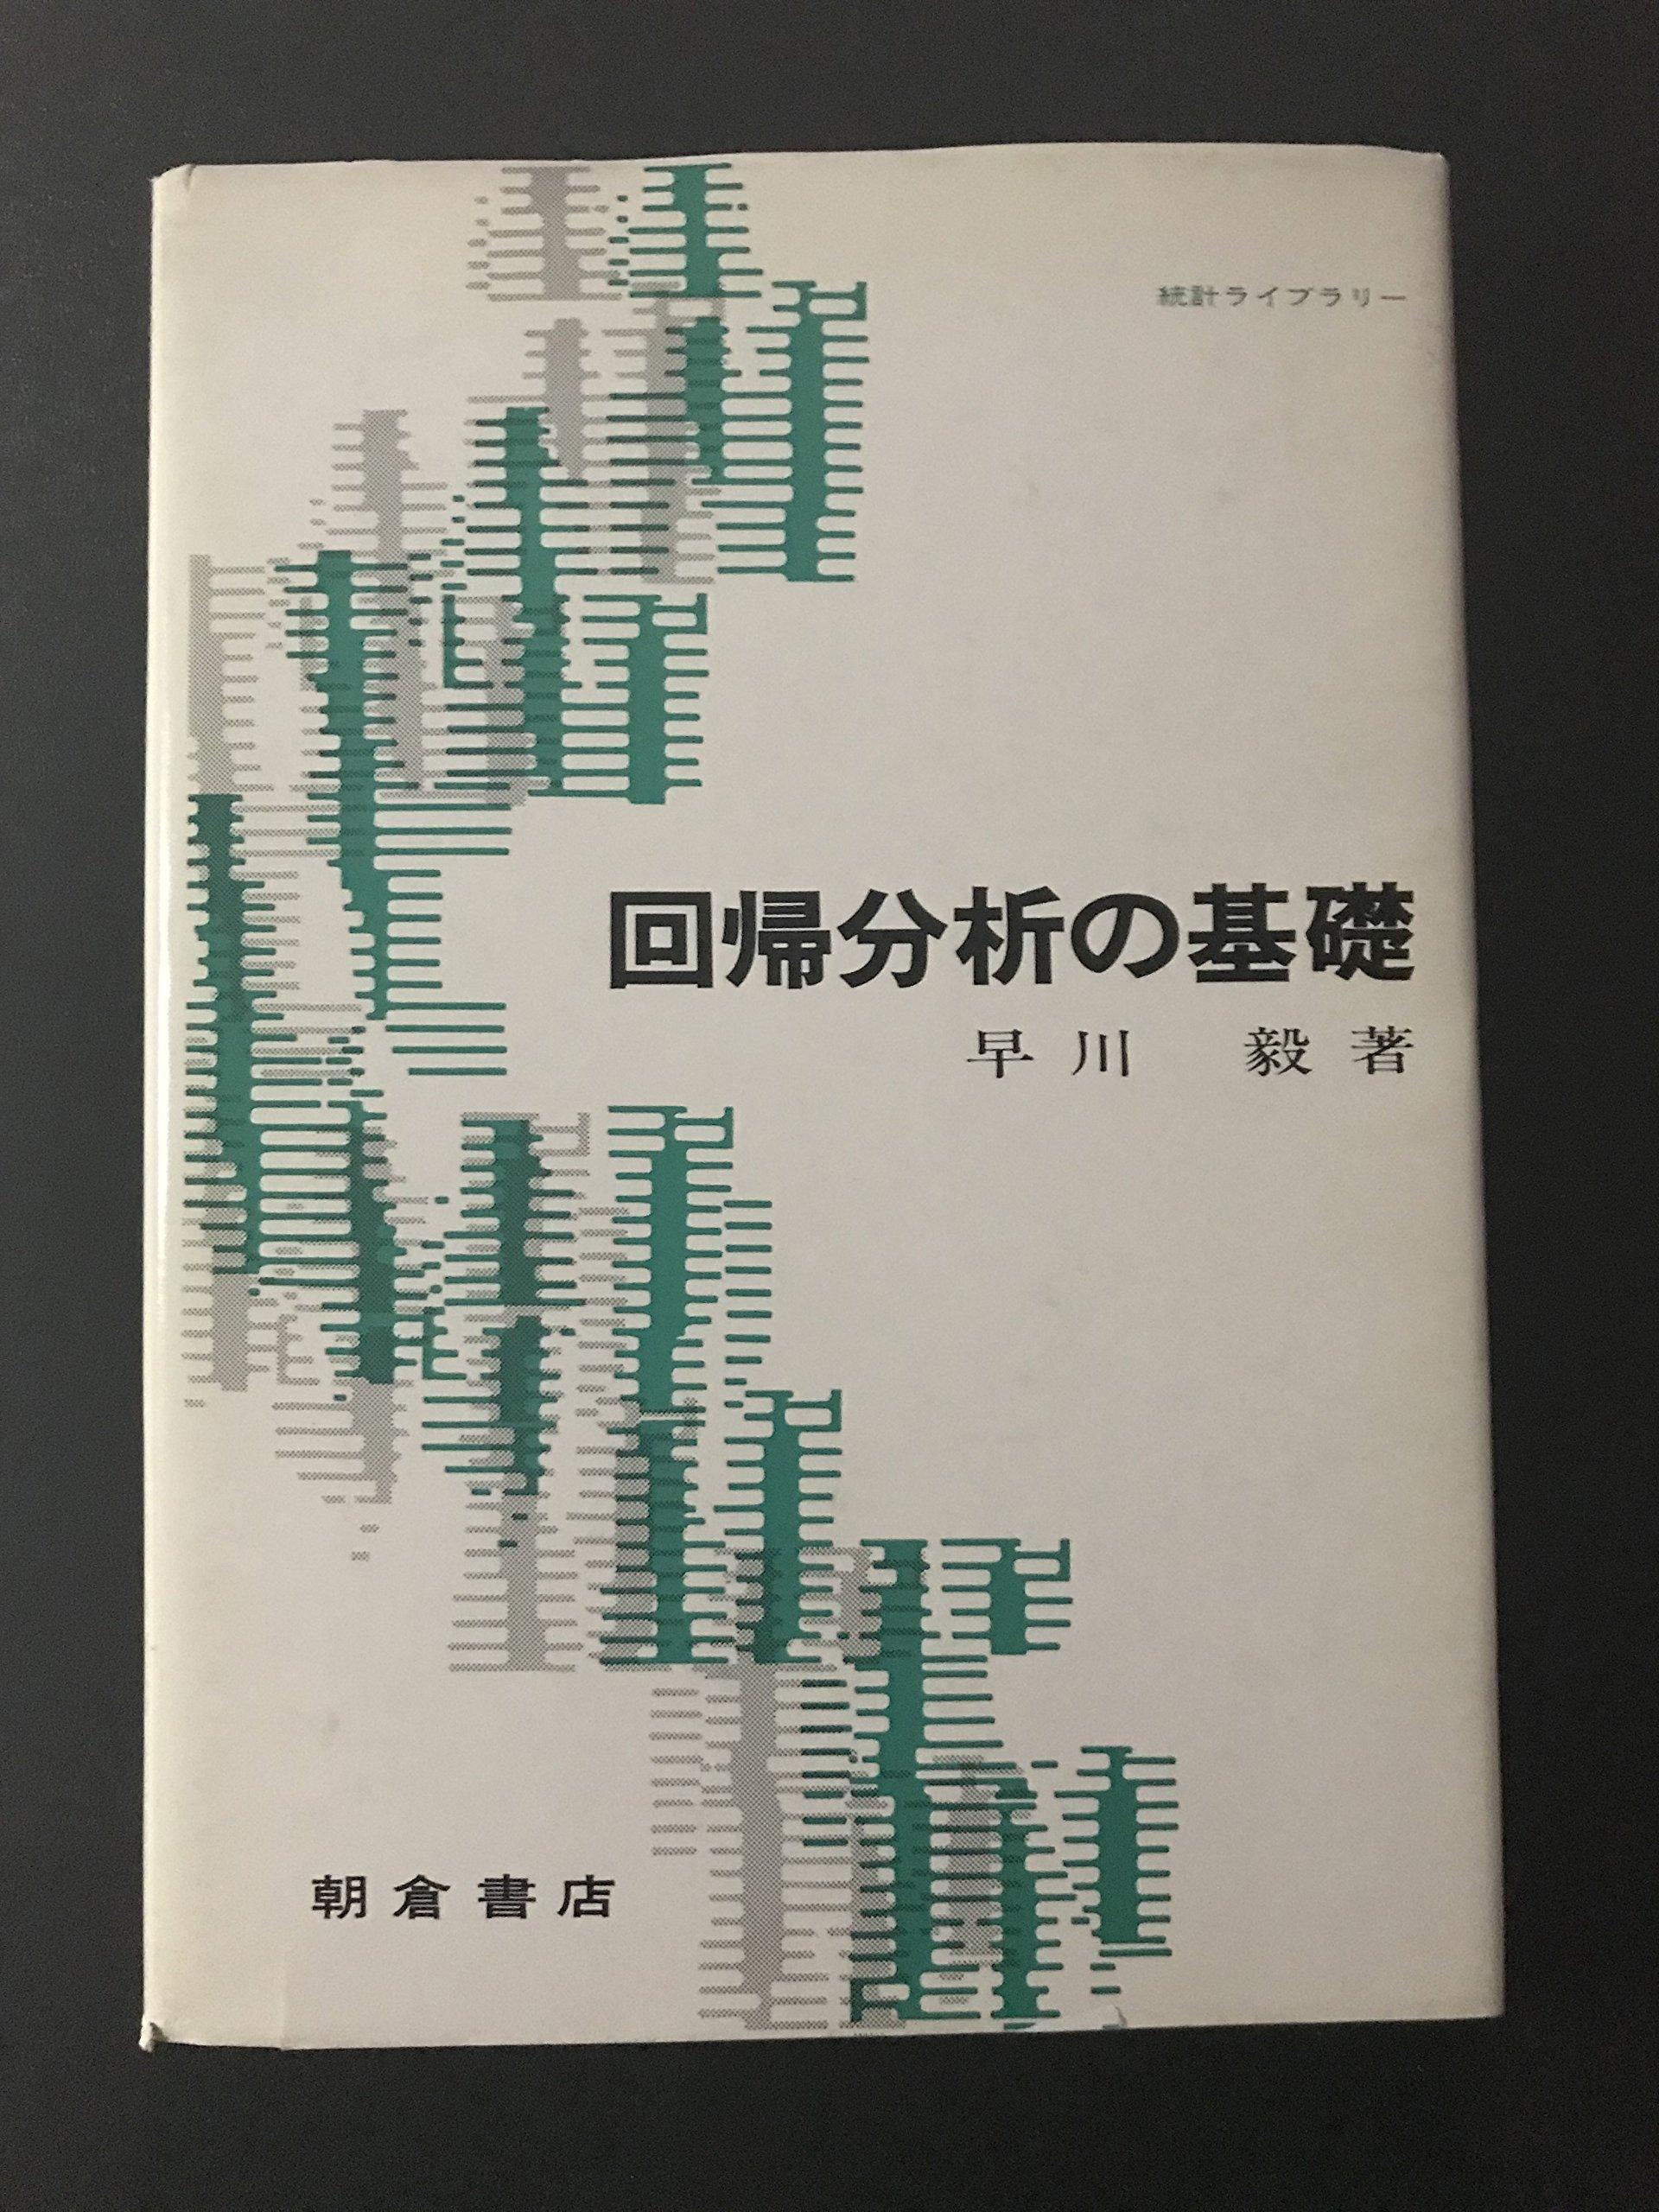 Amazon.co.jp: 回帰分析の基礎 (統計ライブラリー): 早川 毅: 本